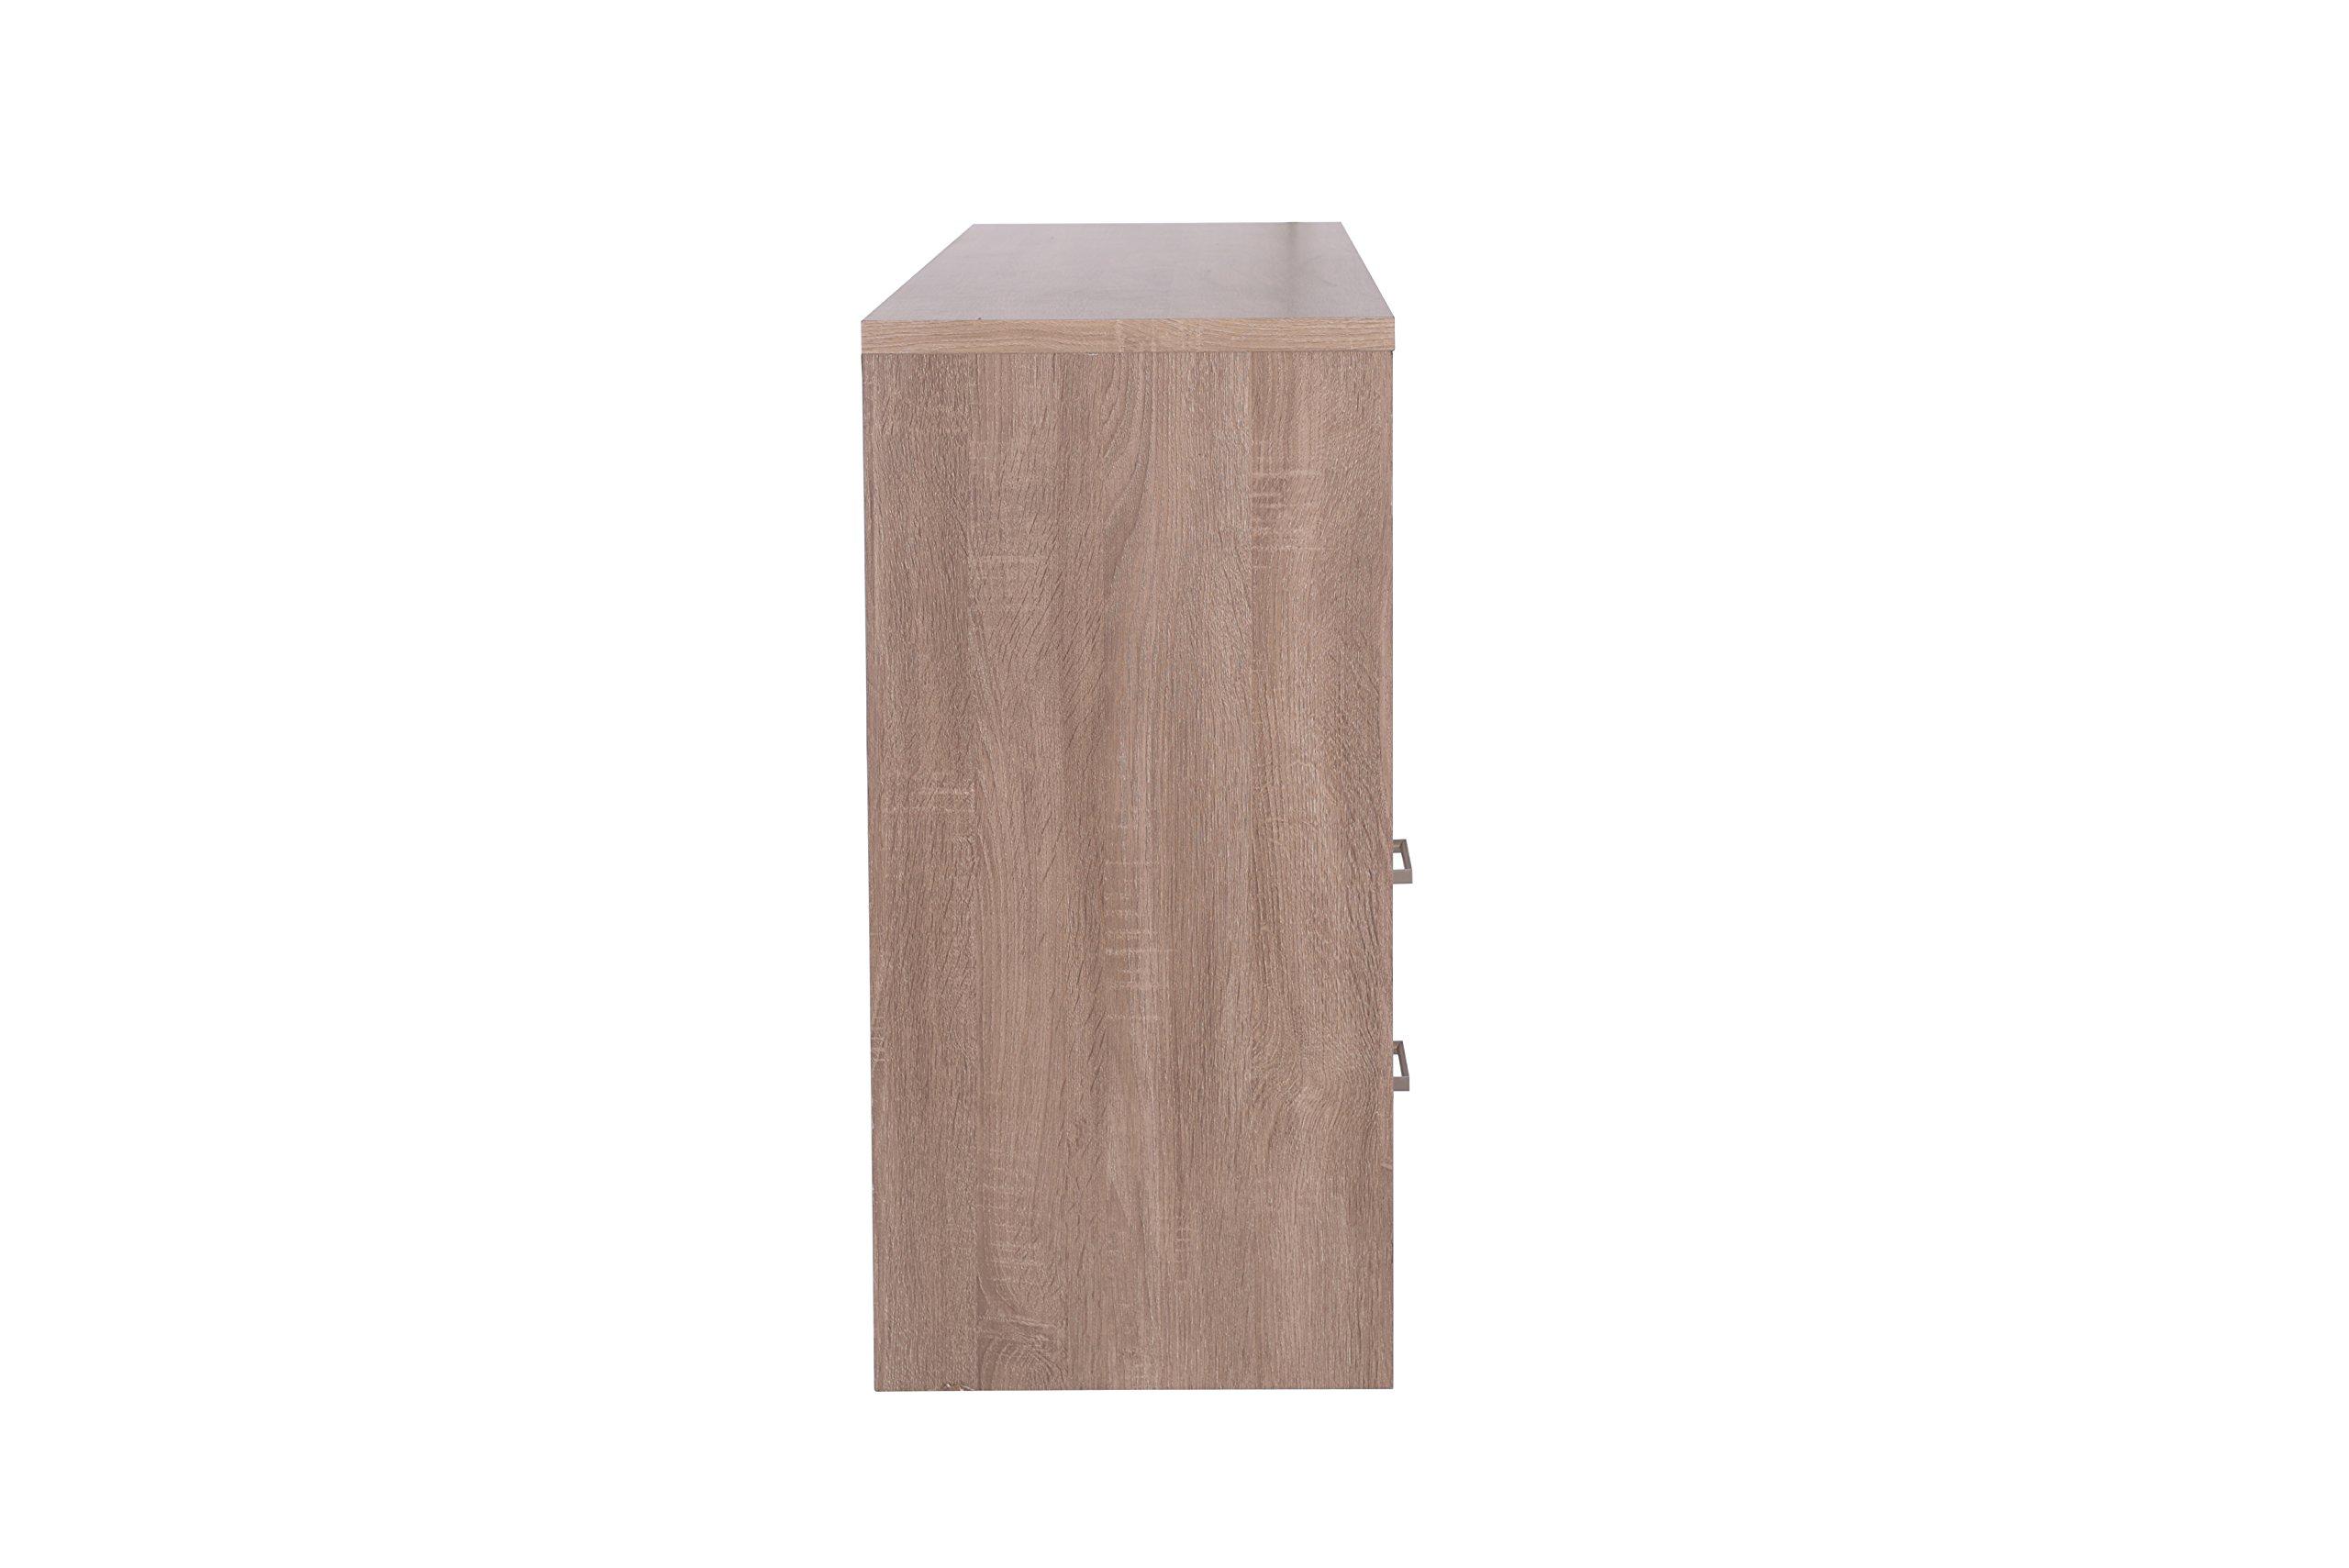 Acme Furniture 72635 Joice Rustic Oak Server by Acme Furniture (Image #6)